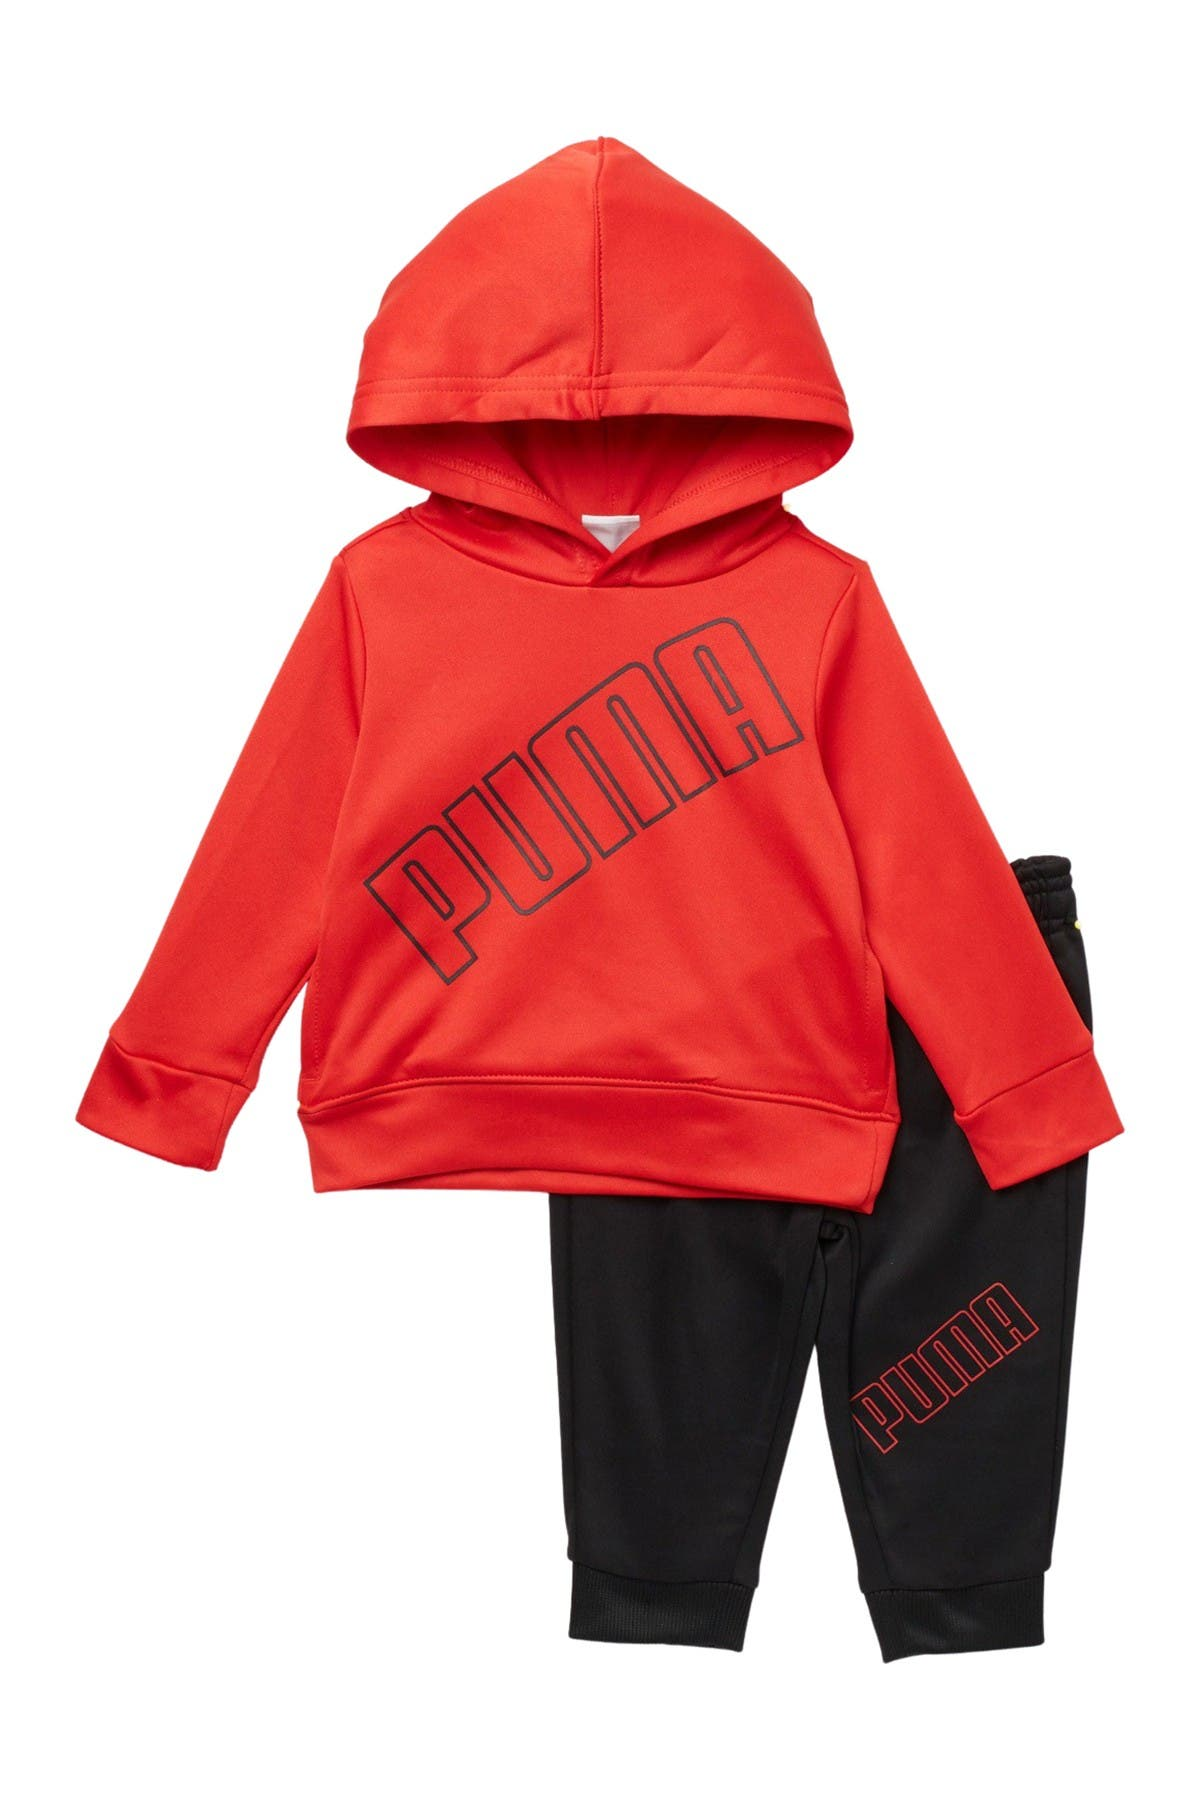 Image of PUMA Poly Fleece Pullover Hoodie & Leggings Set